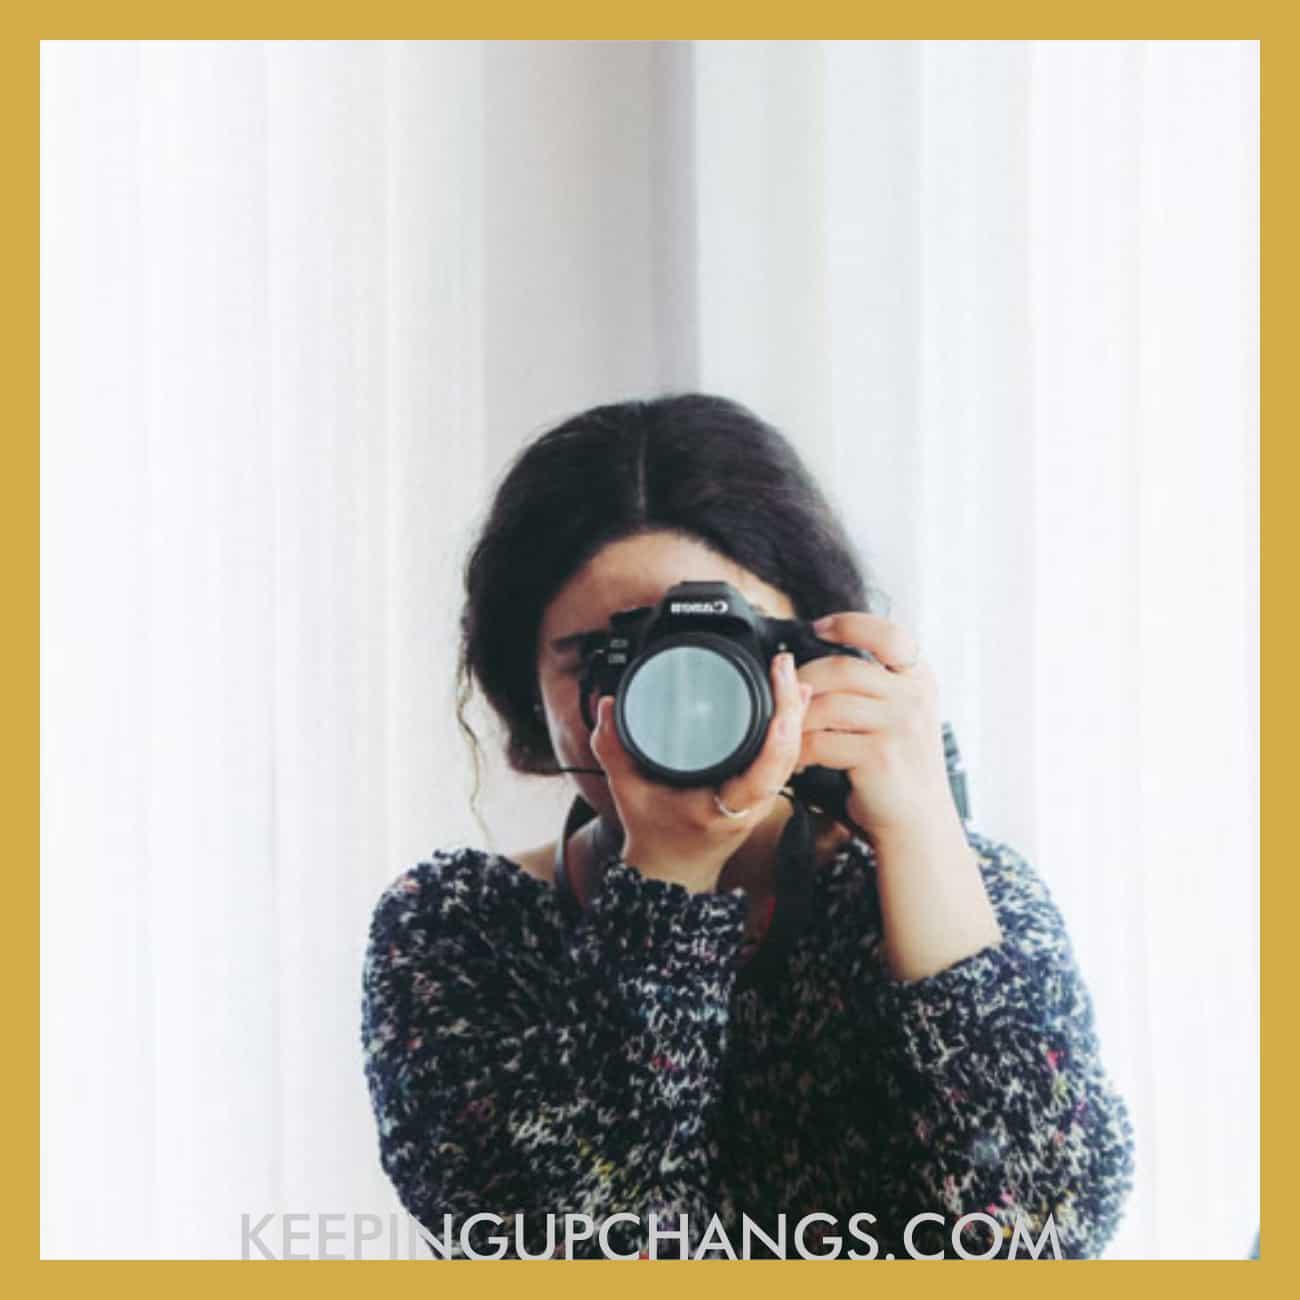 girl pointing camera lens to take photo.